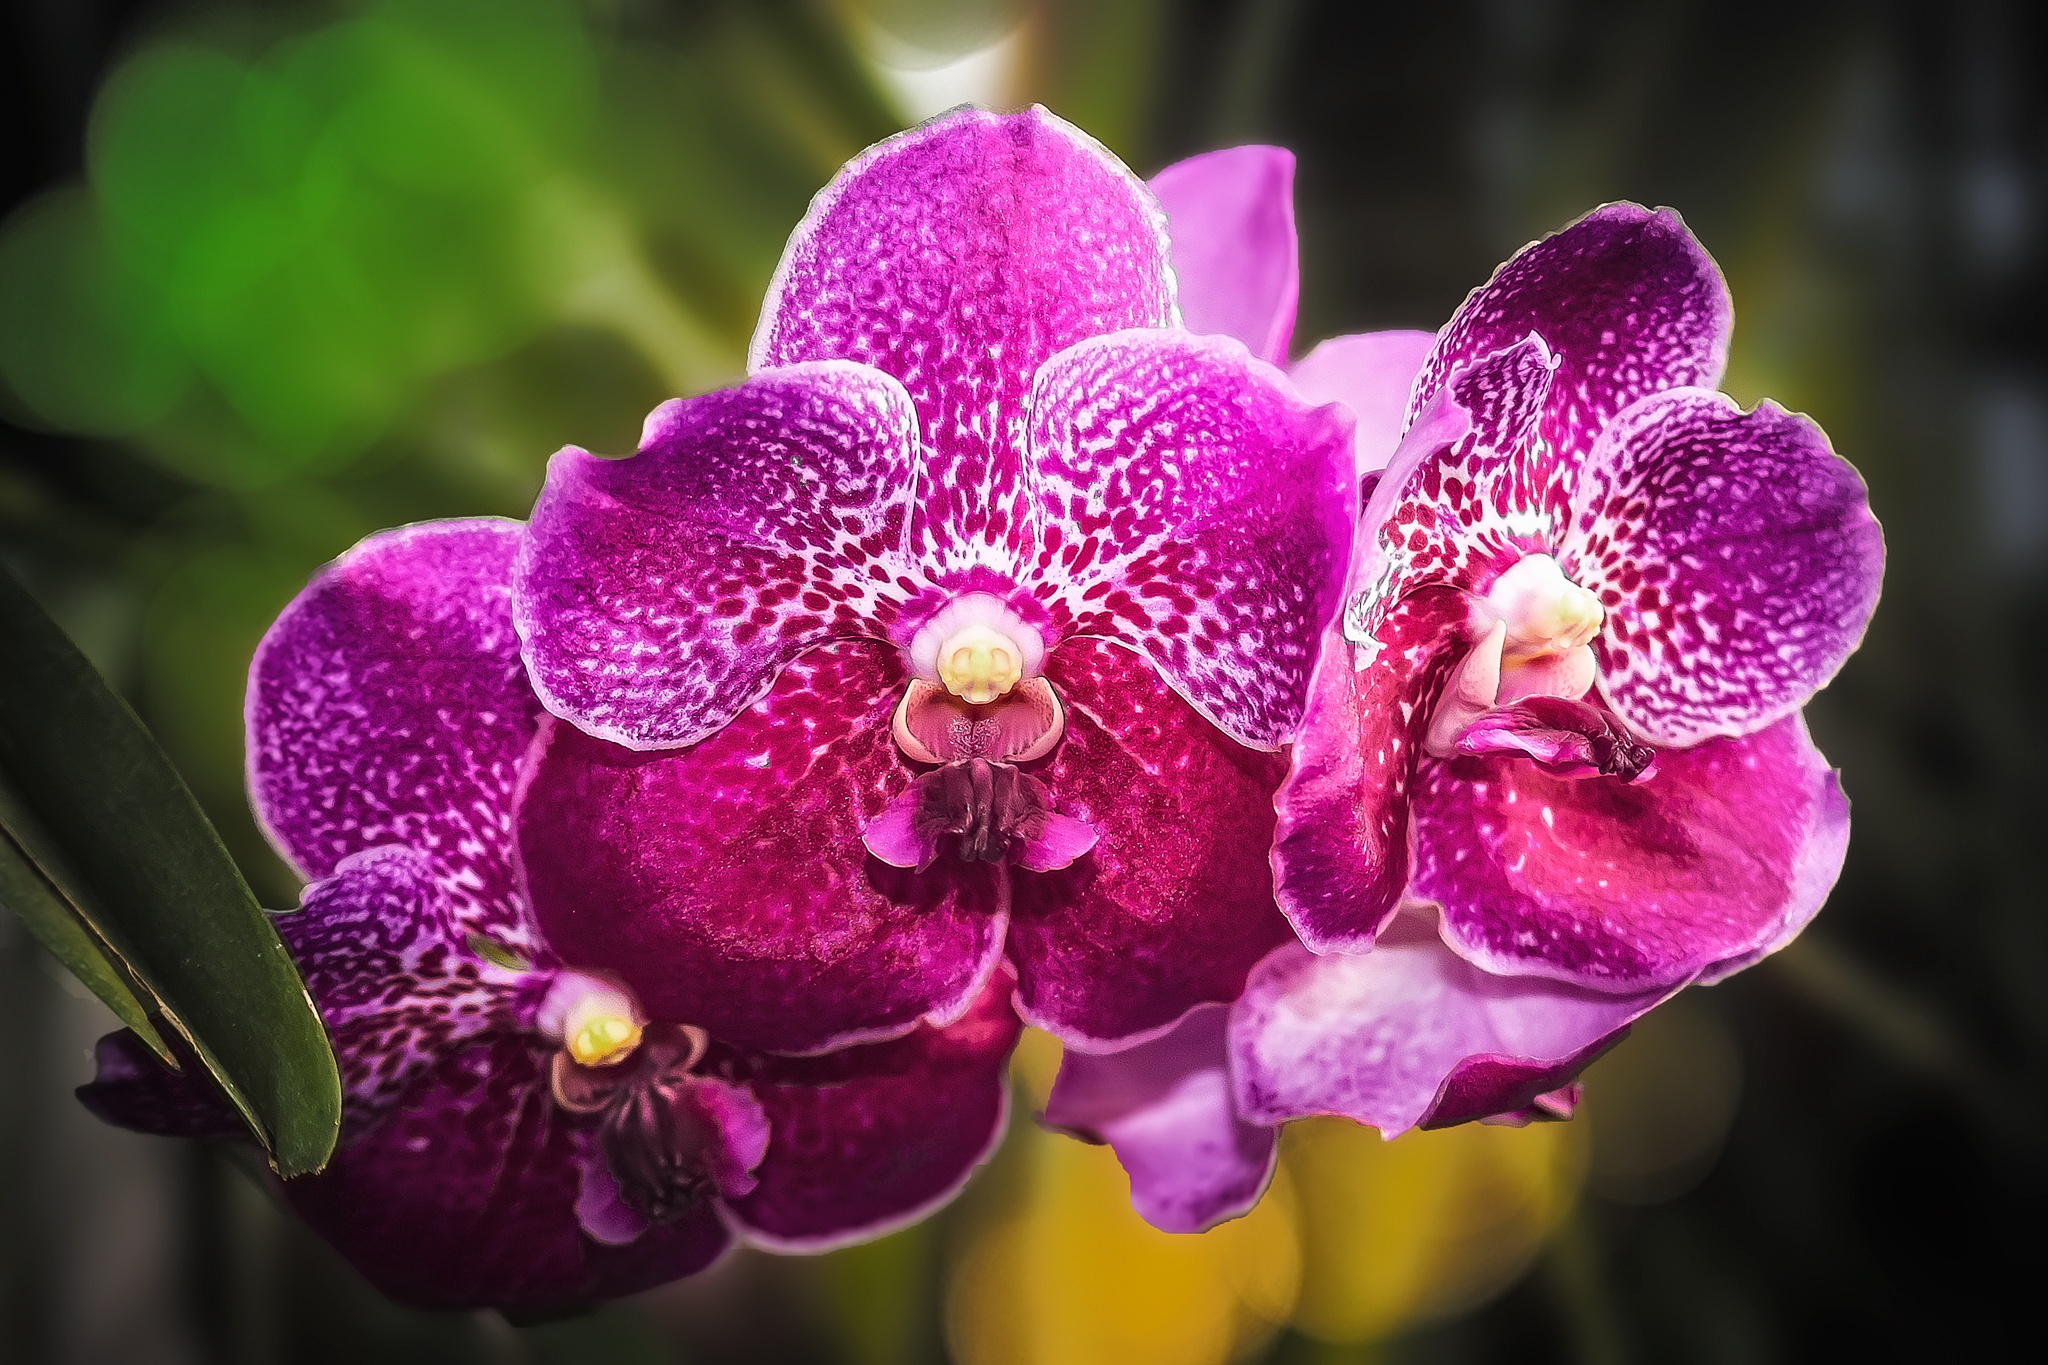 Orchids 21 by Tony Guzman